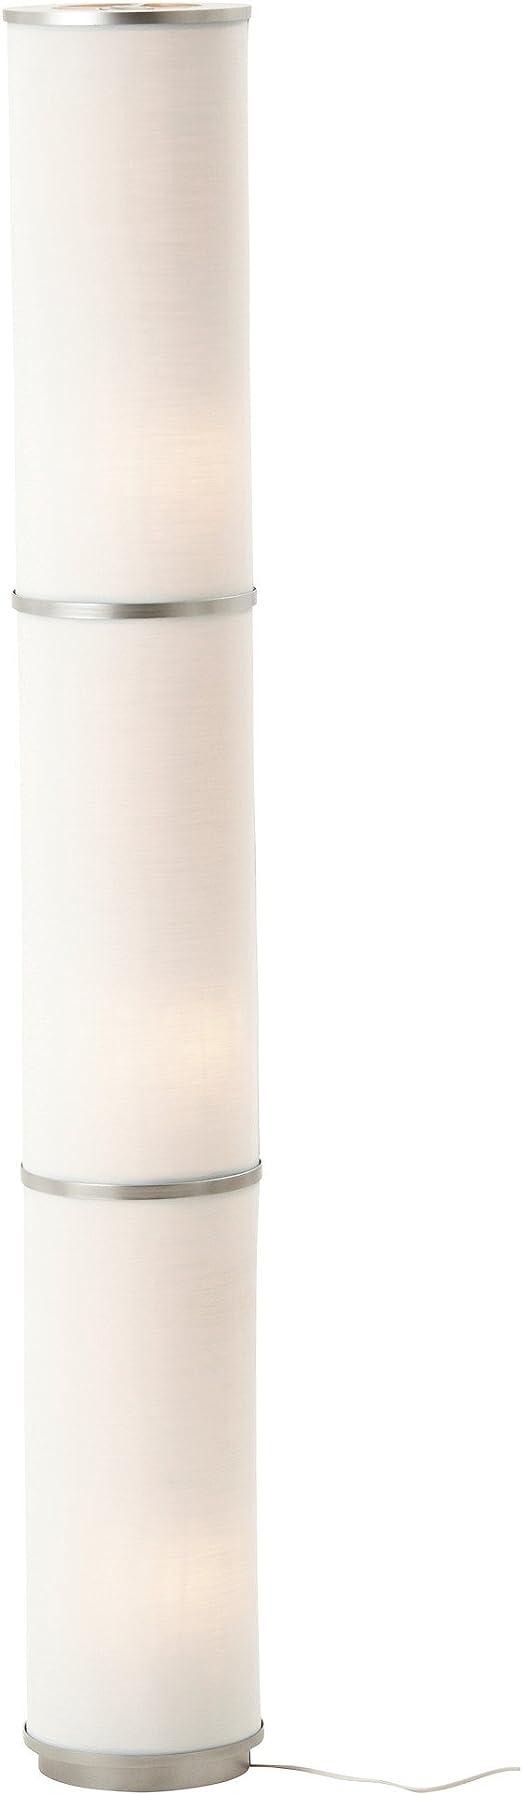 Ikea Vidja Stehlampe Weiss Amazon De Kuche Haushalt